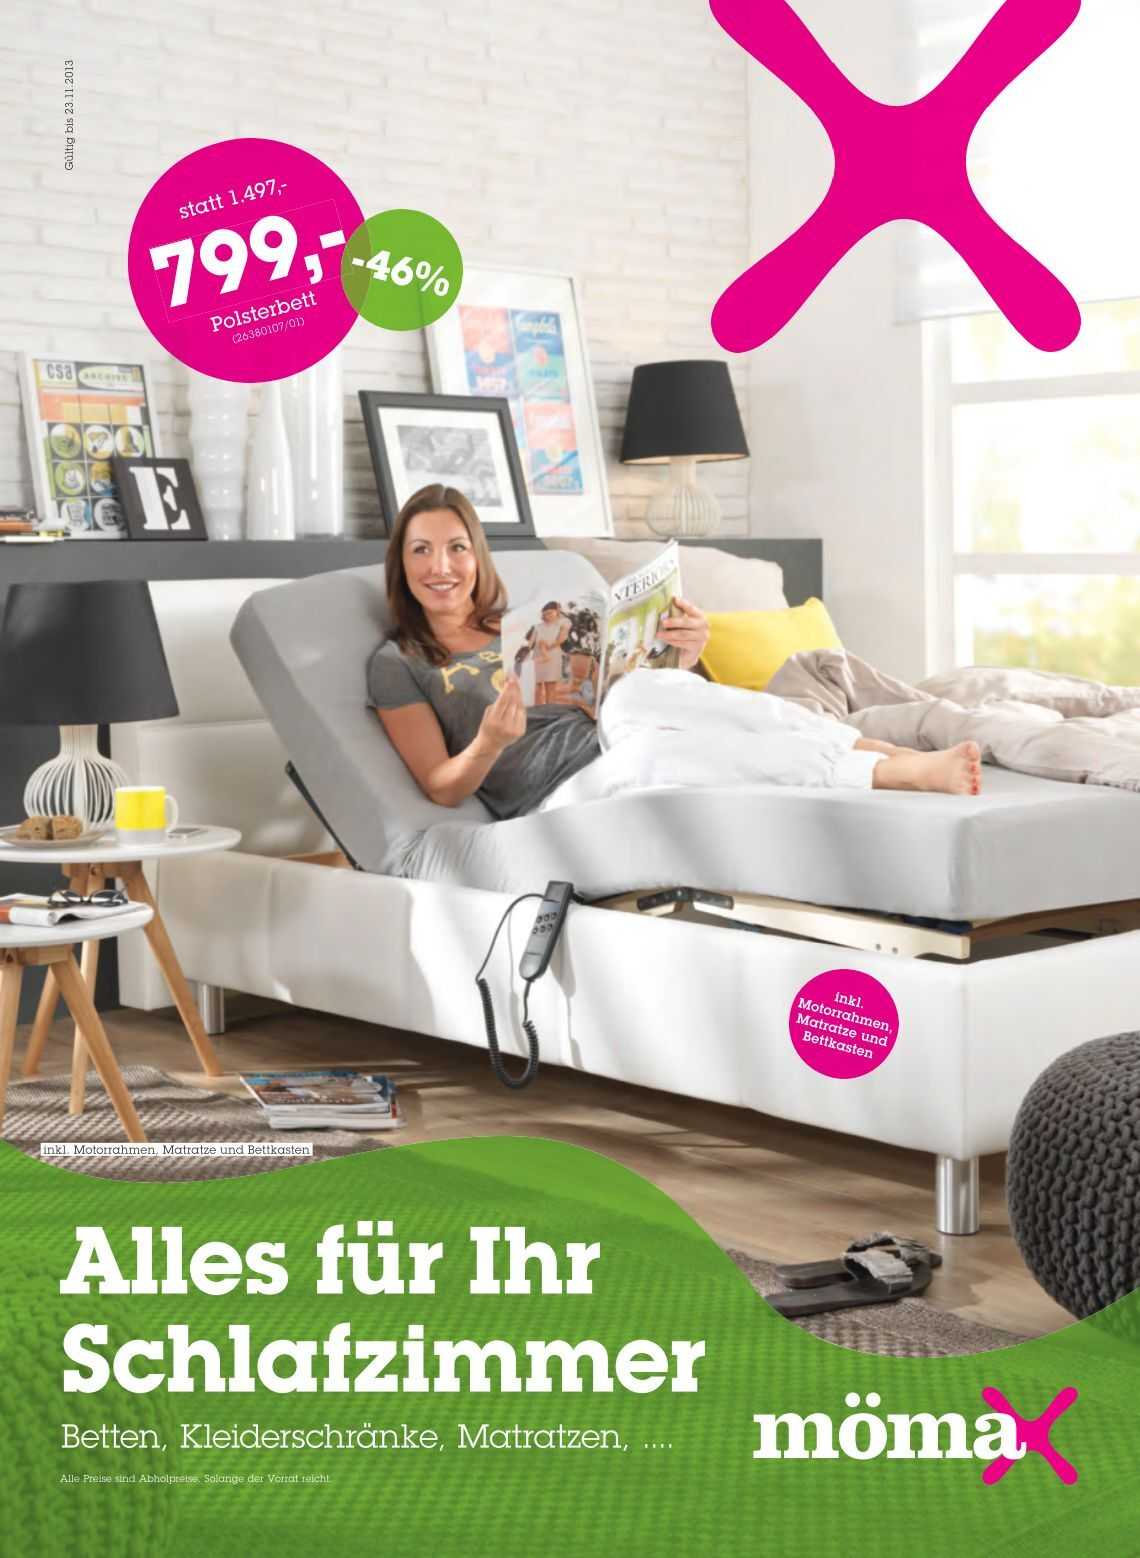 60 free magazines from moemax.de